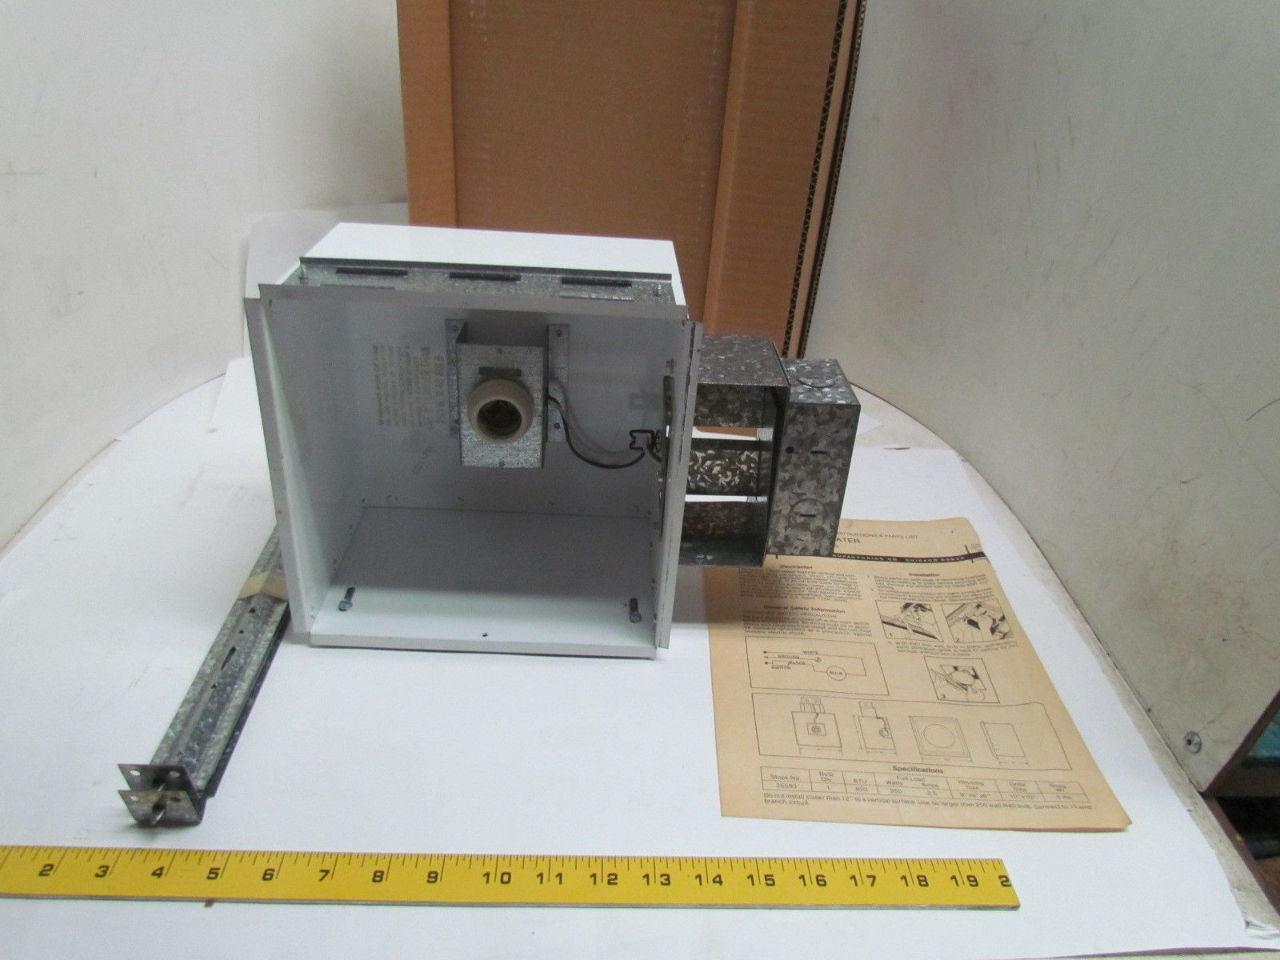 Dayton Electric 2e593 Single Bulb Ceiling Heater 115v Nib